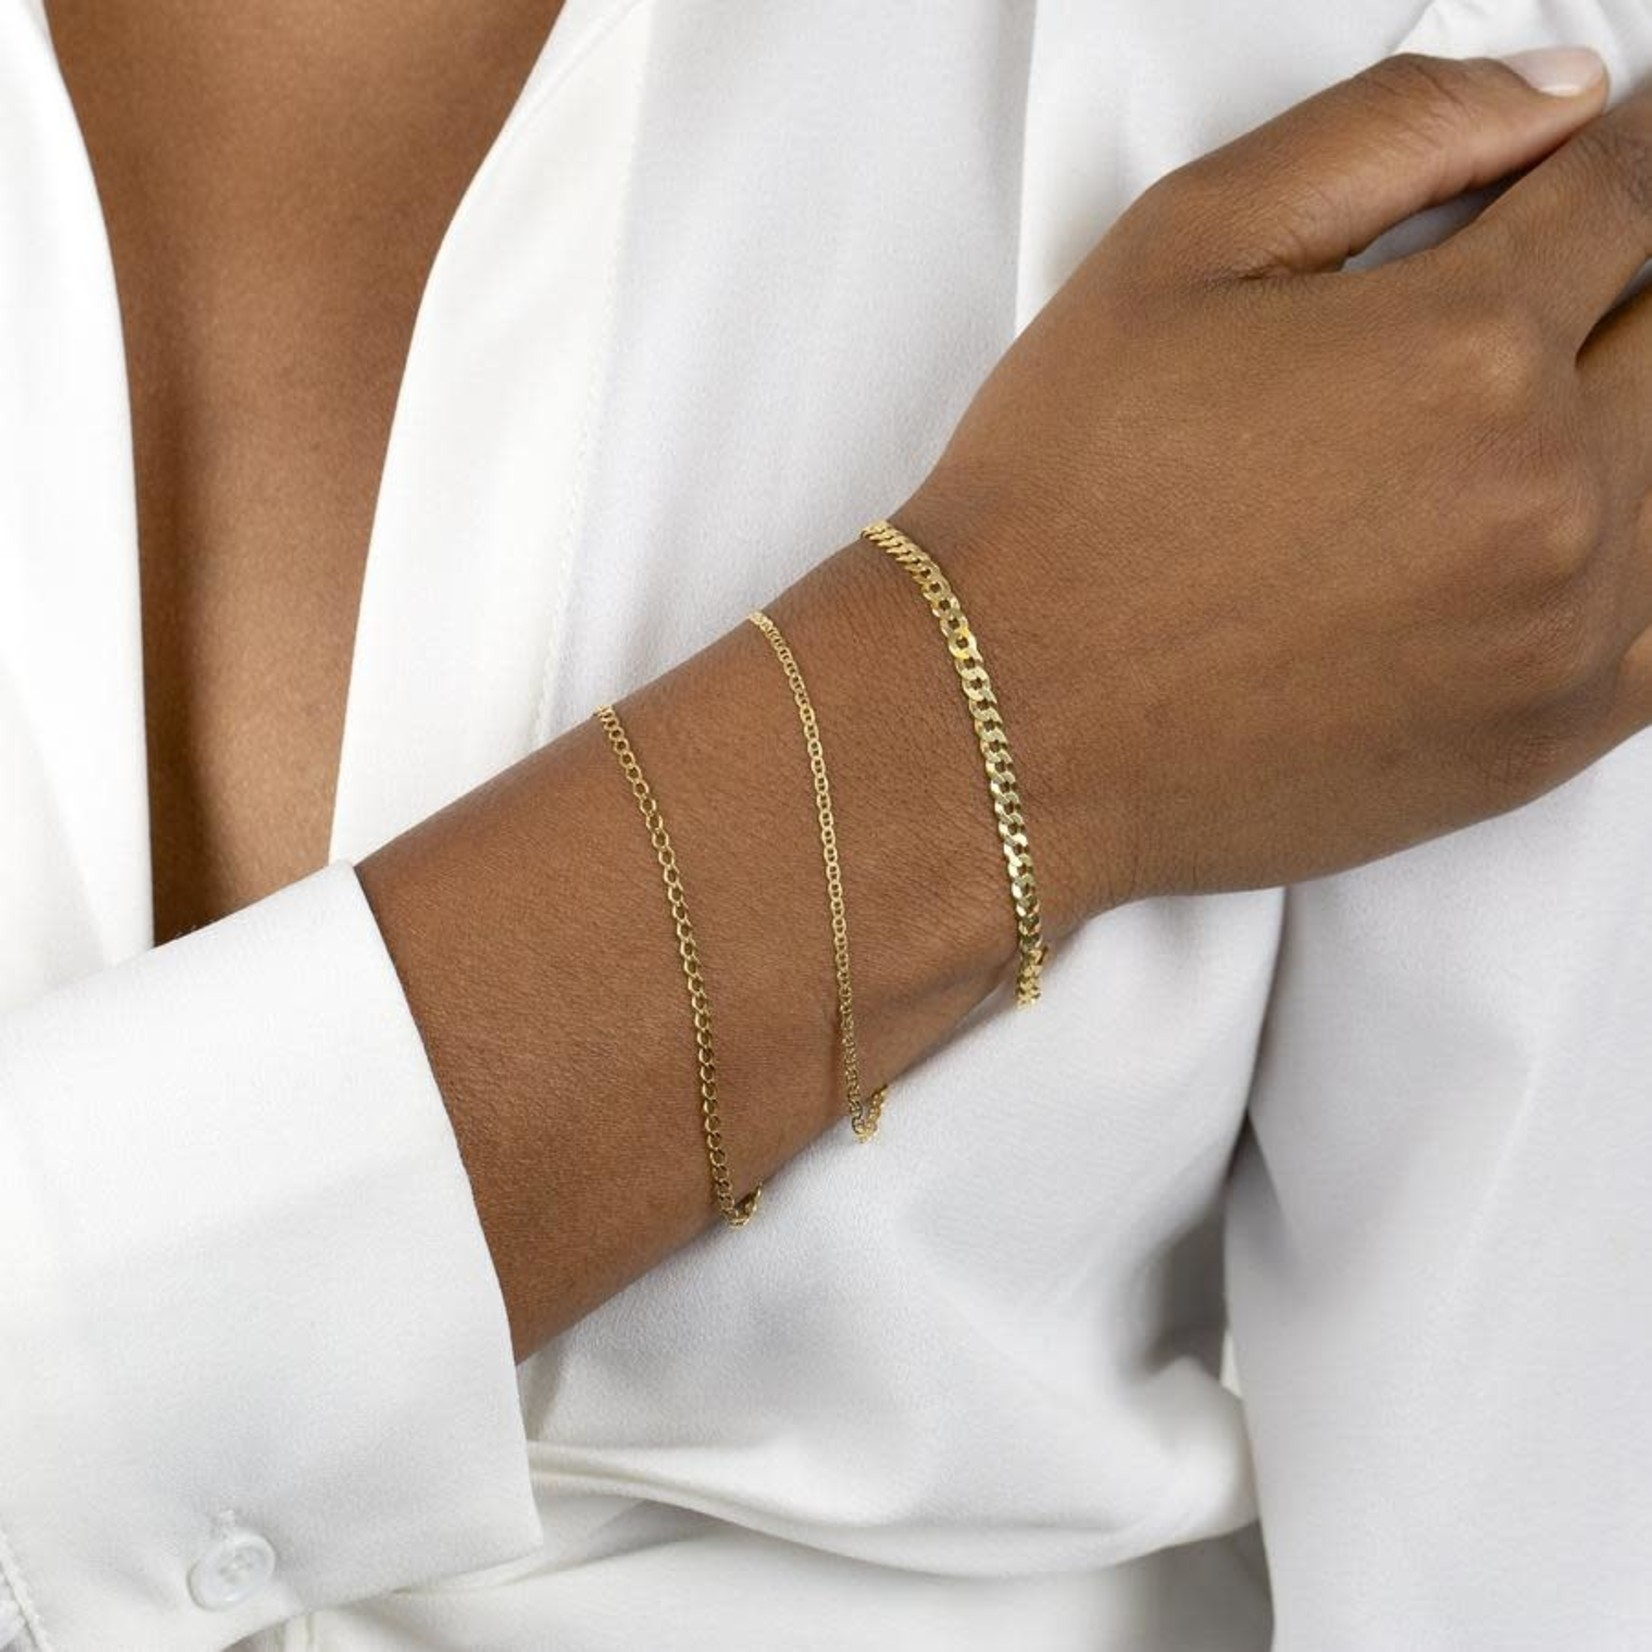 Adinas Baby Gucci Bracelet